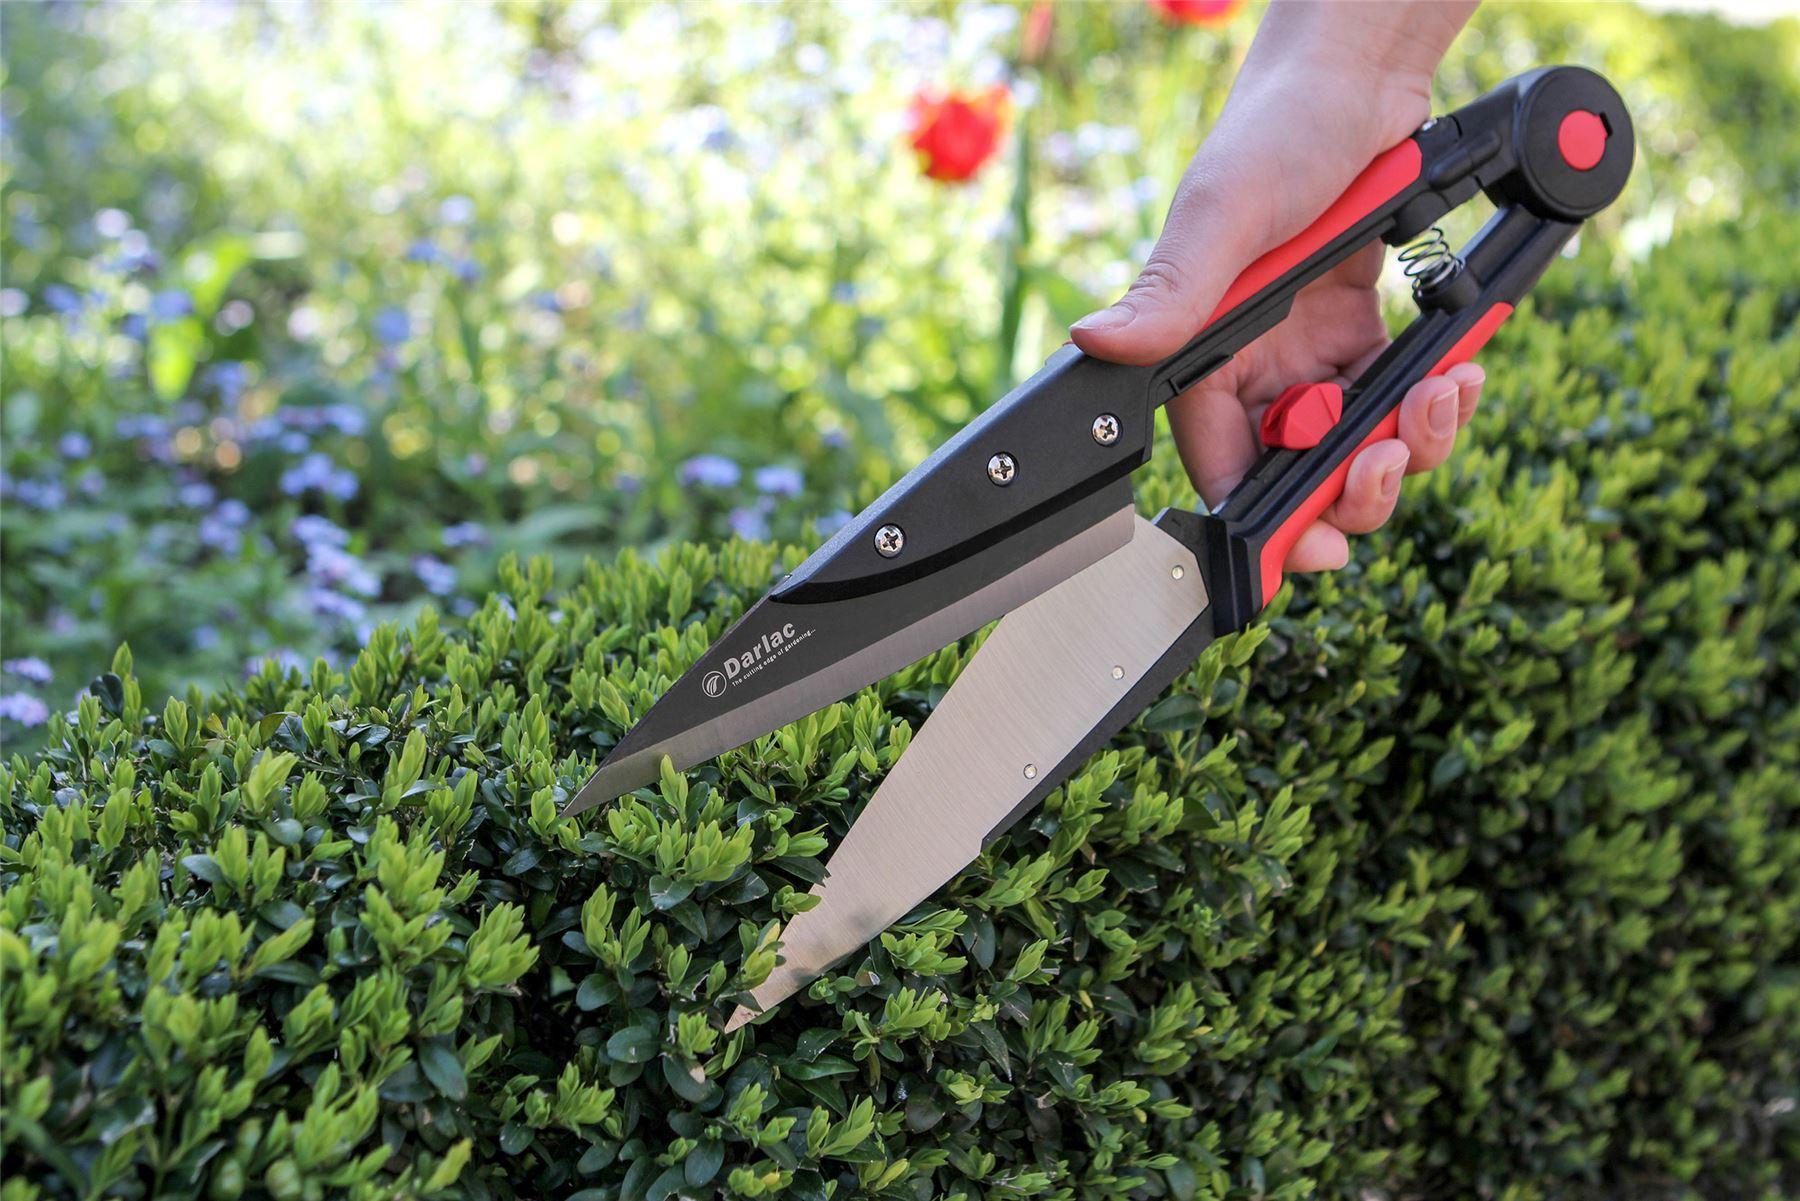 Pruning Shaping Darlac DP1850 Professional Topiary Shear